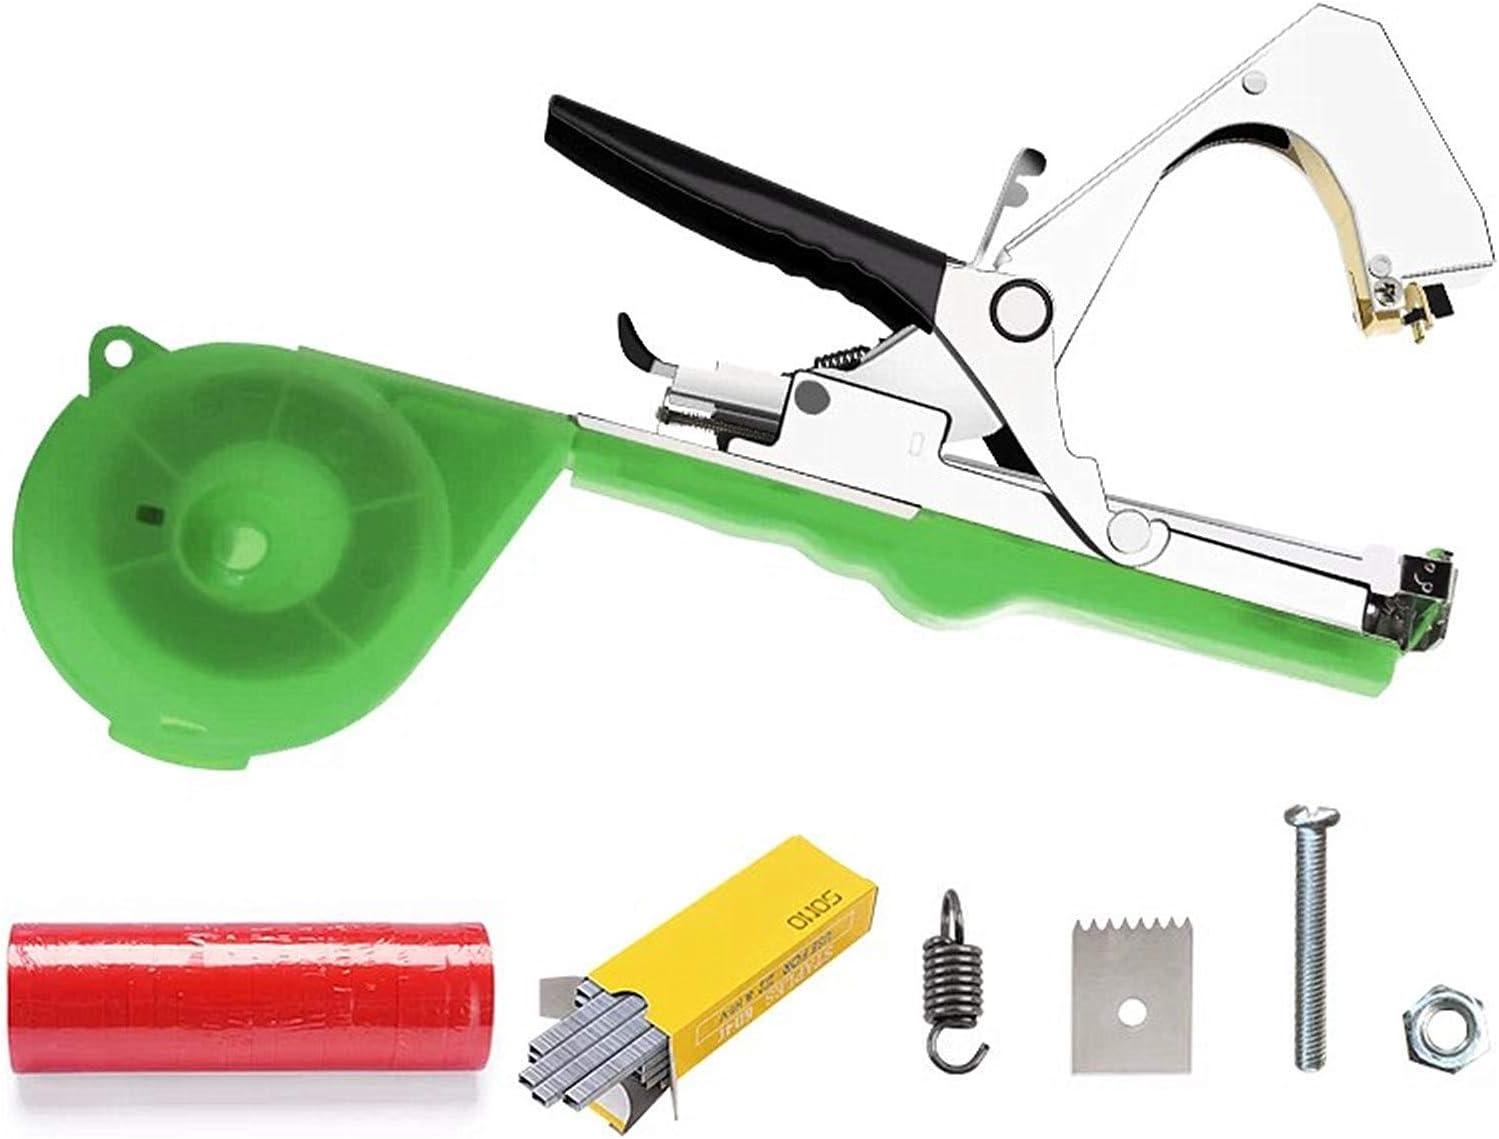 HECHUANGYP Plant Strapping Machine Gardening Tape Gun Tool セール品 当店は最高な サービスを提供します wit